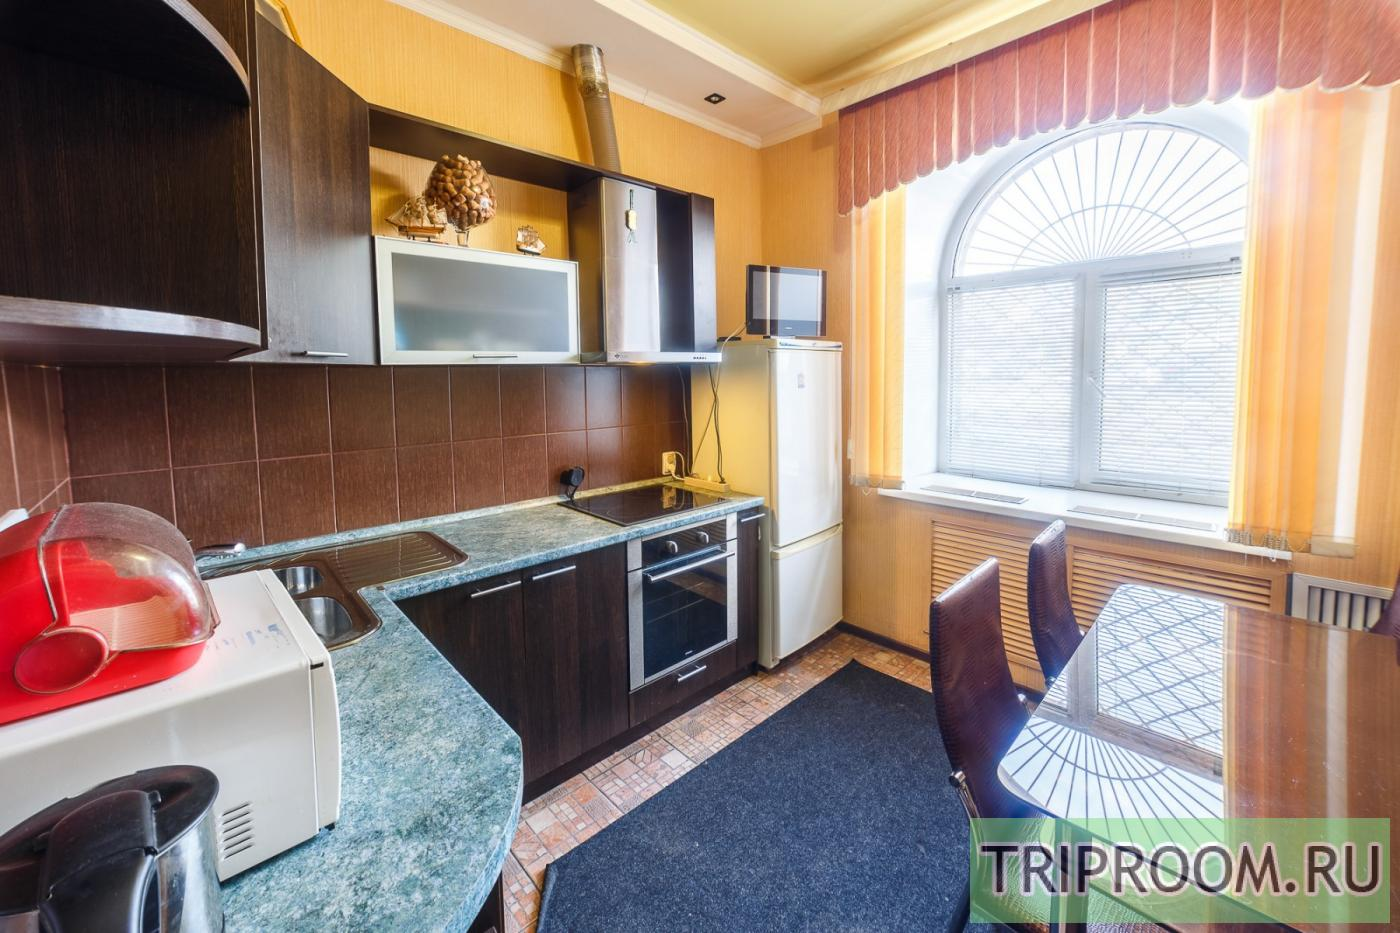 3-комнатная квартира посуточно (вариант № 15948), ул. Назарбаева улица, фото № 17